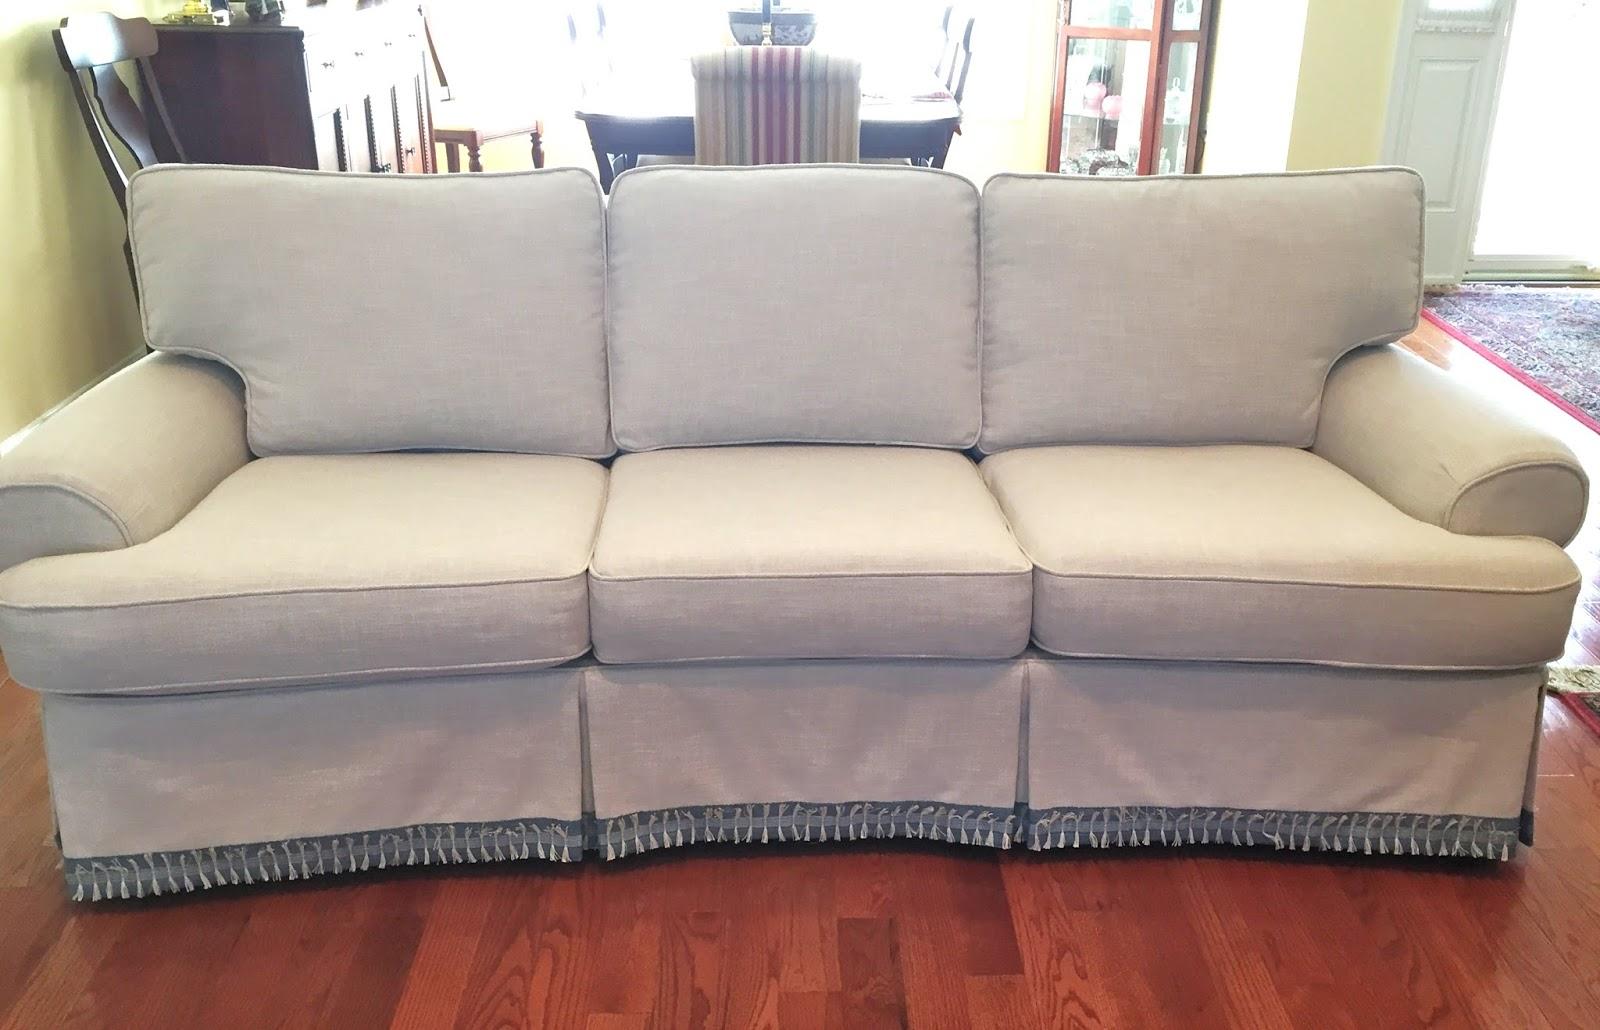 slipcover linen slipcovered xmas thanksgiving couch tutorial simplylinen slipcovers